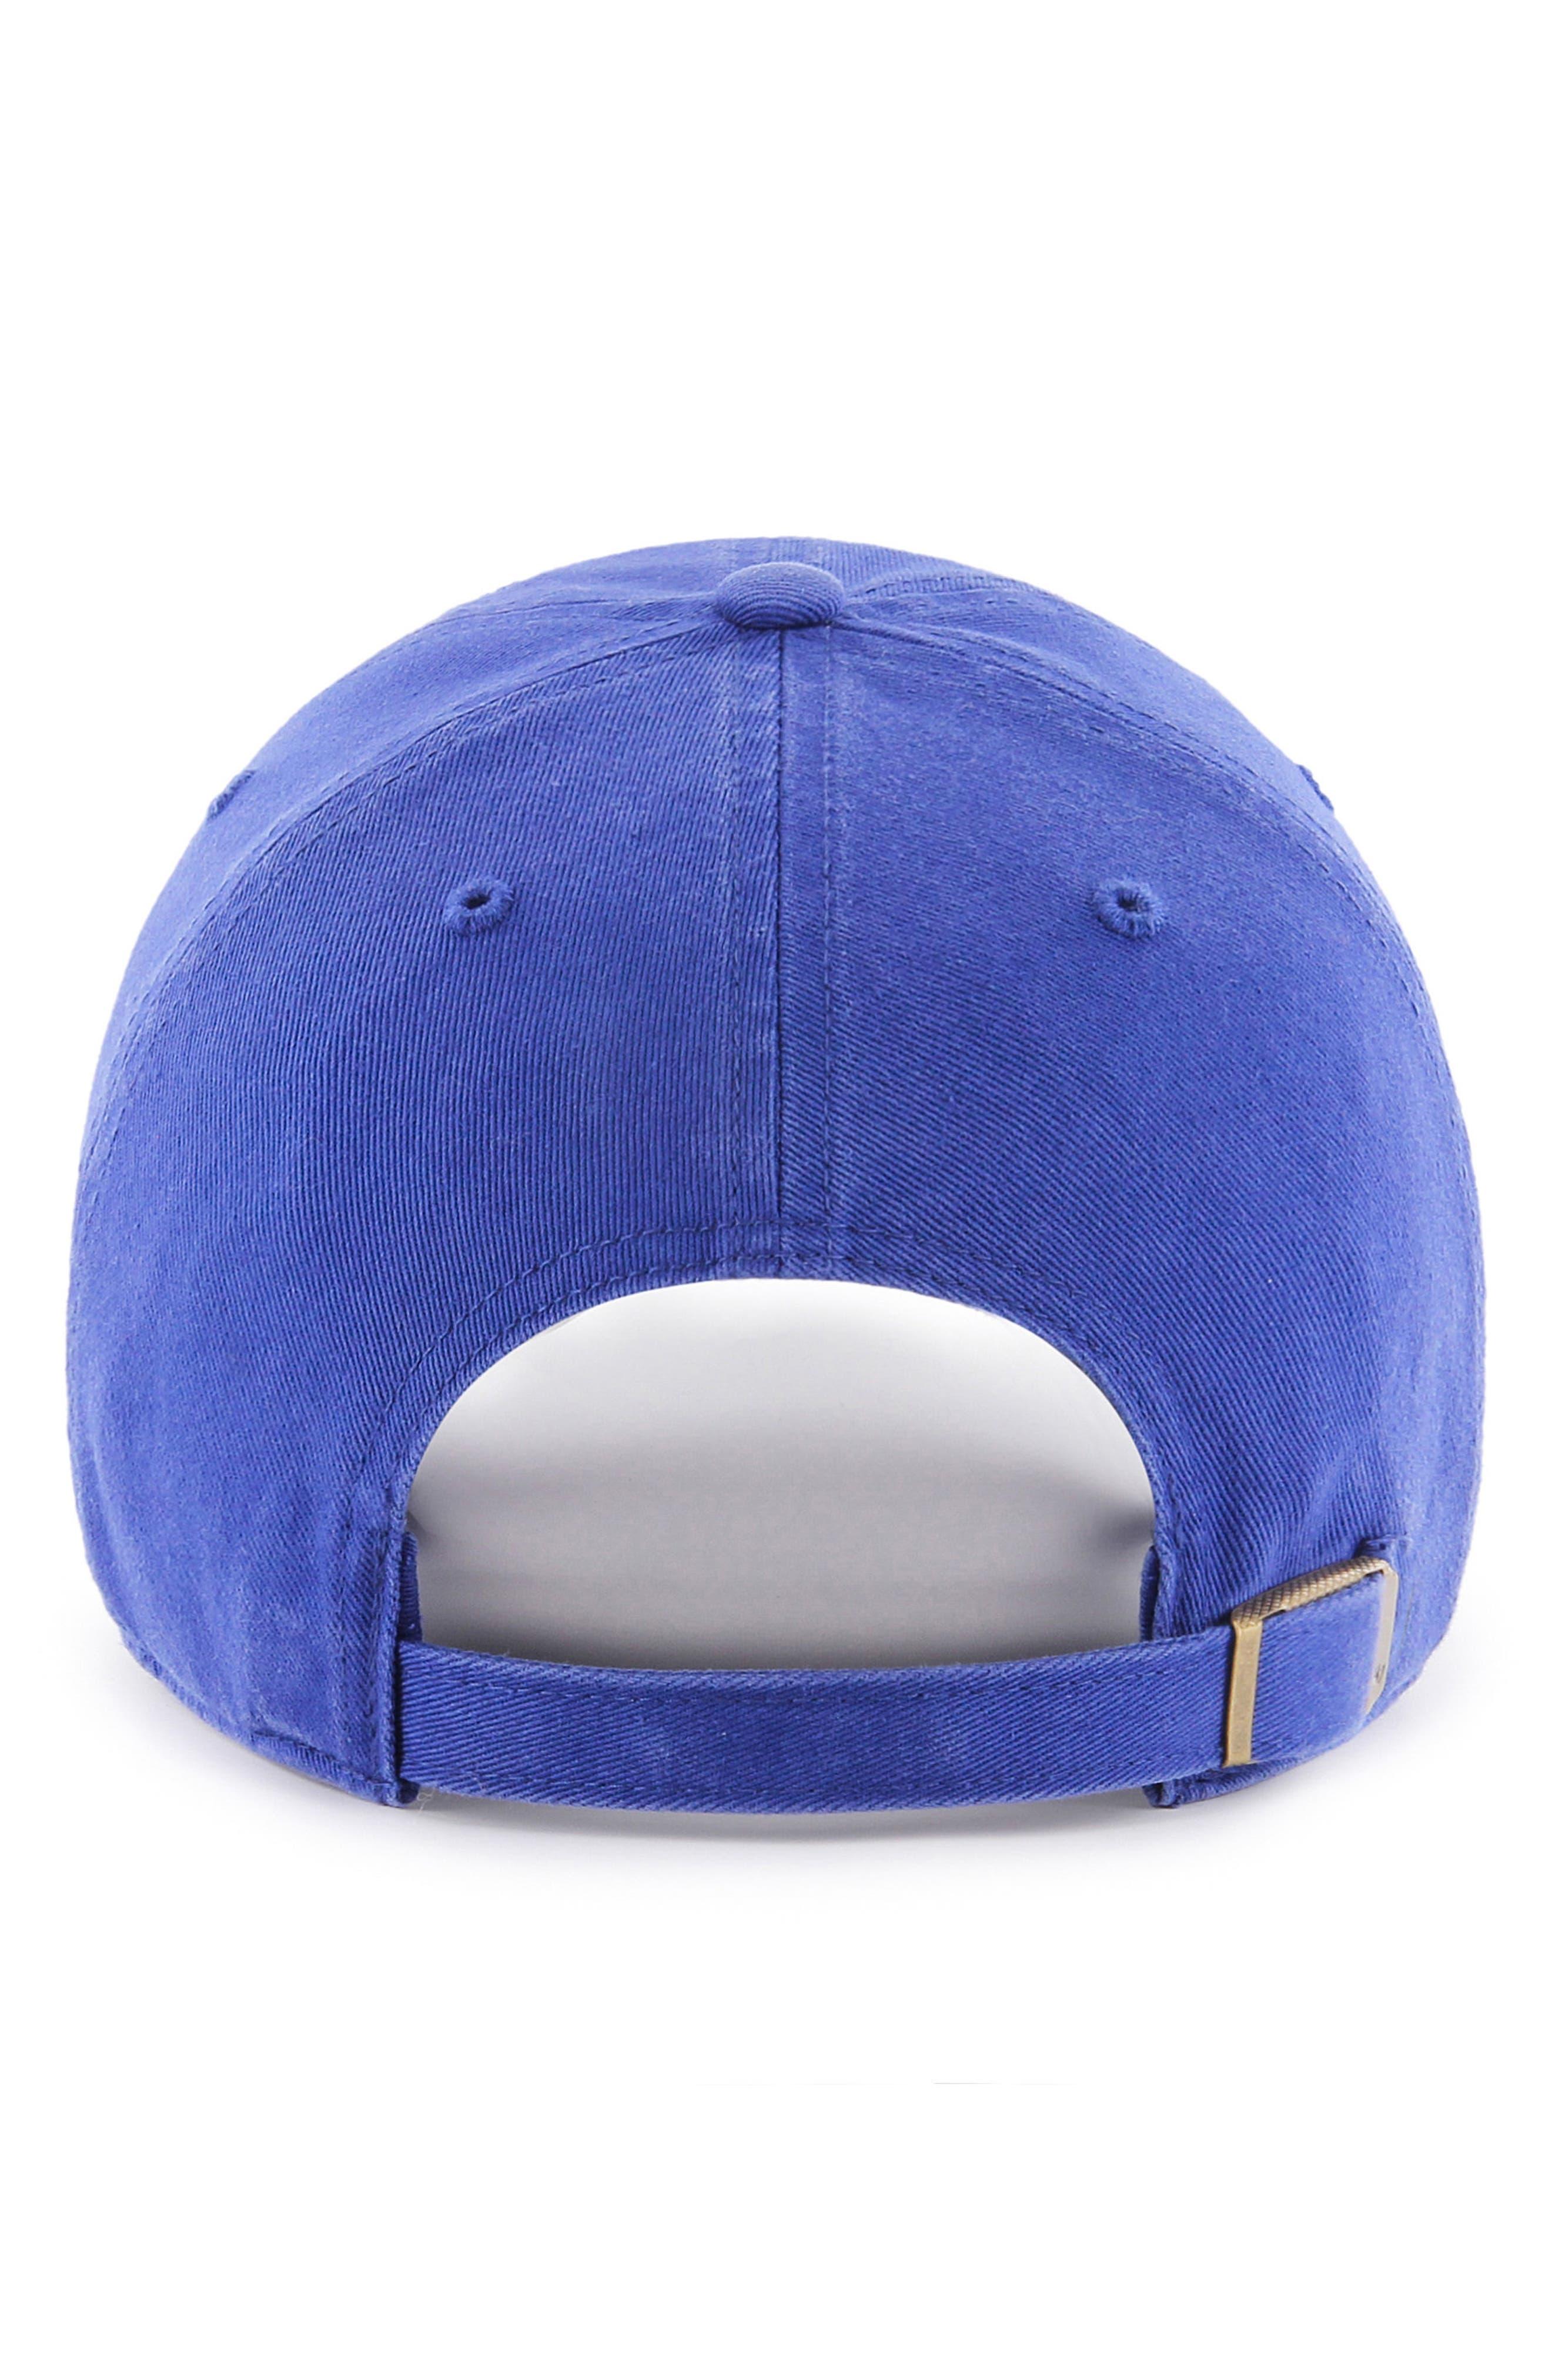 MLB Cooperstown Logo Ball Cap,                             Alternate thumbnail 17, color,